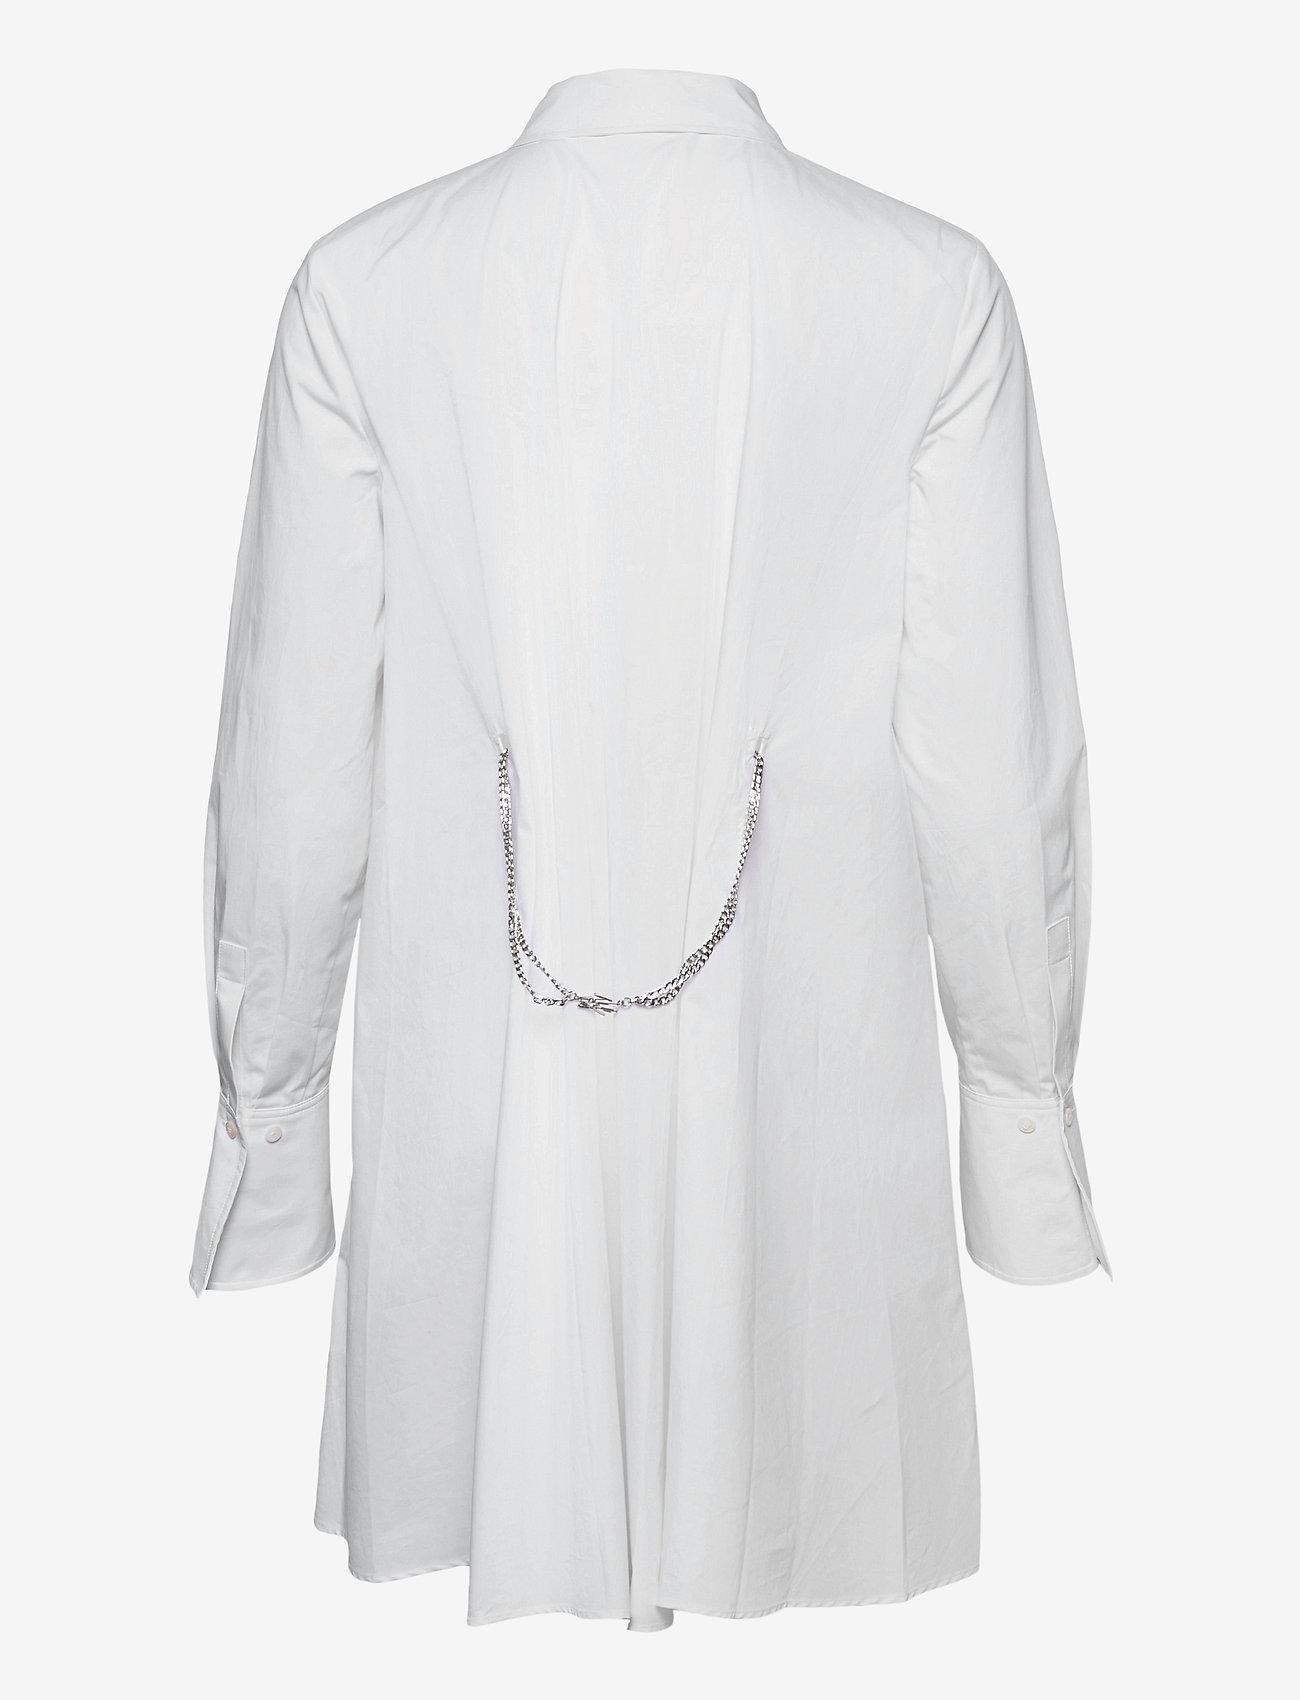 Karl Lagerfeld - embellished poplin tunic shirt - tunikaer - white - 1